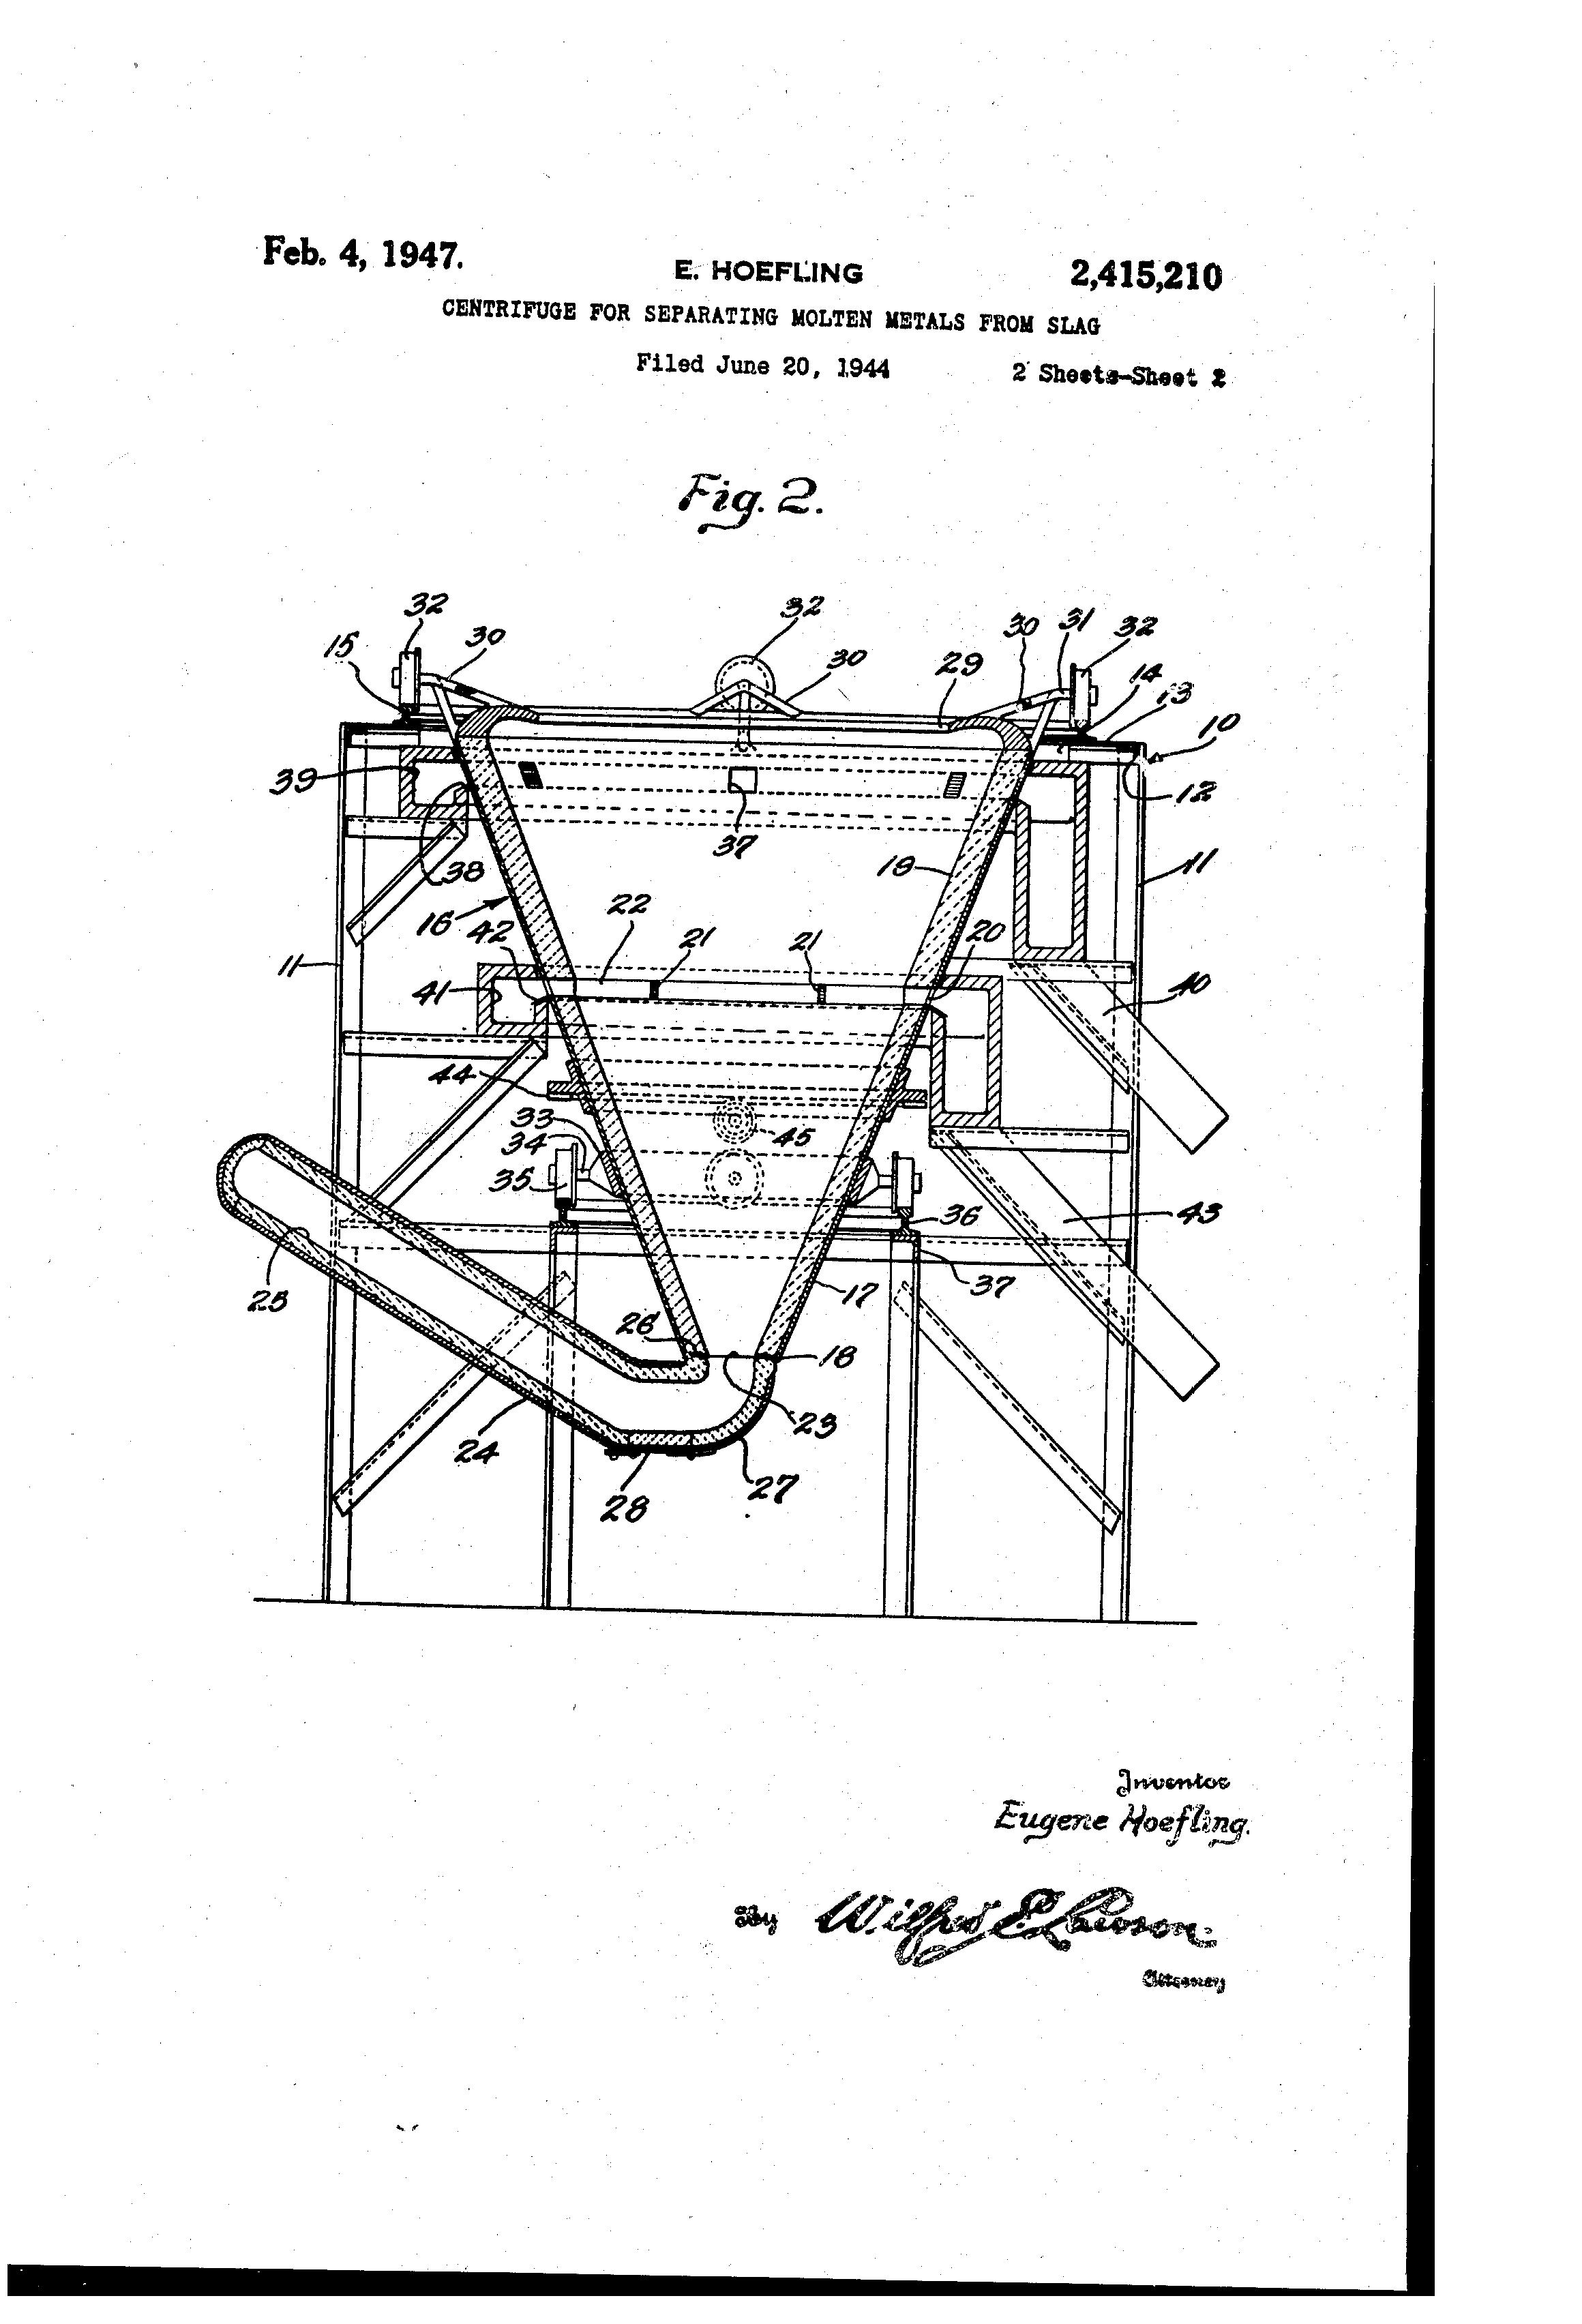 Sand And Slag Separator : Patent us centrifuge for separating molten metals